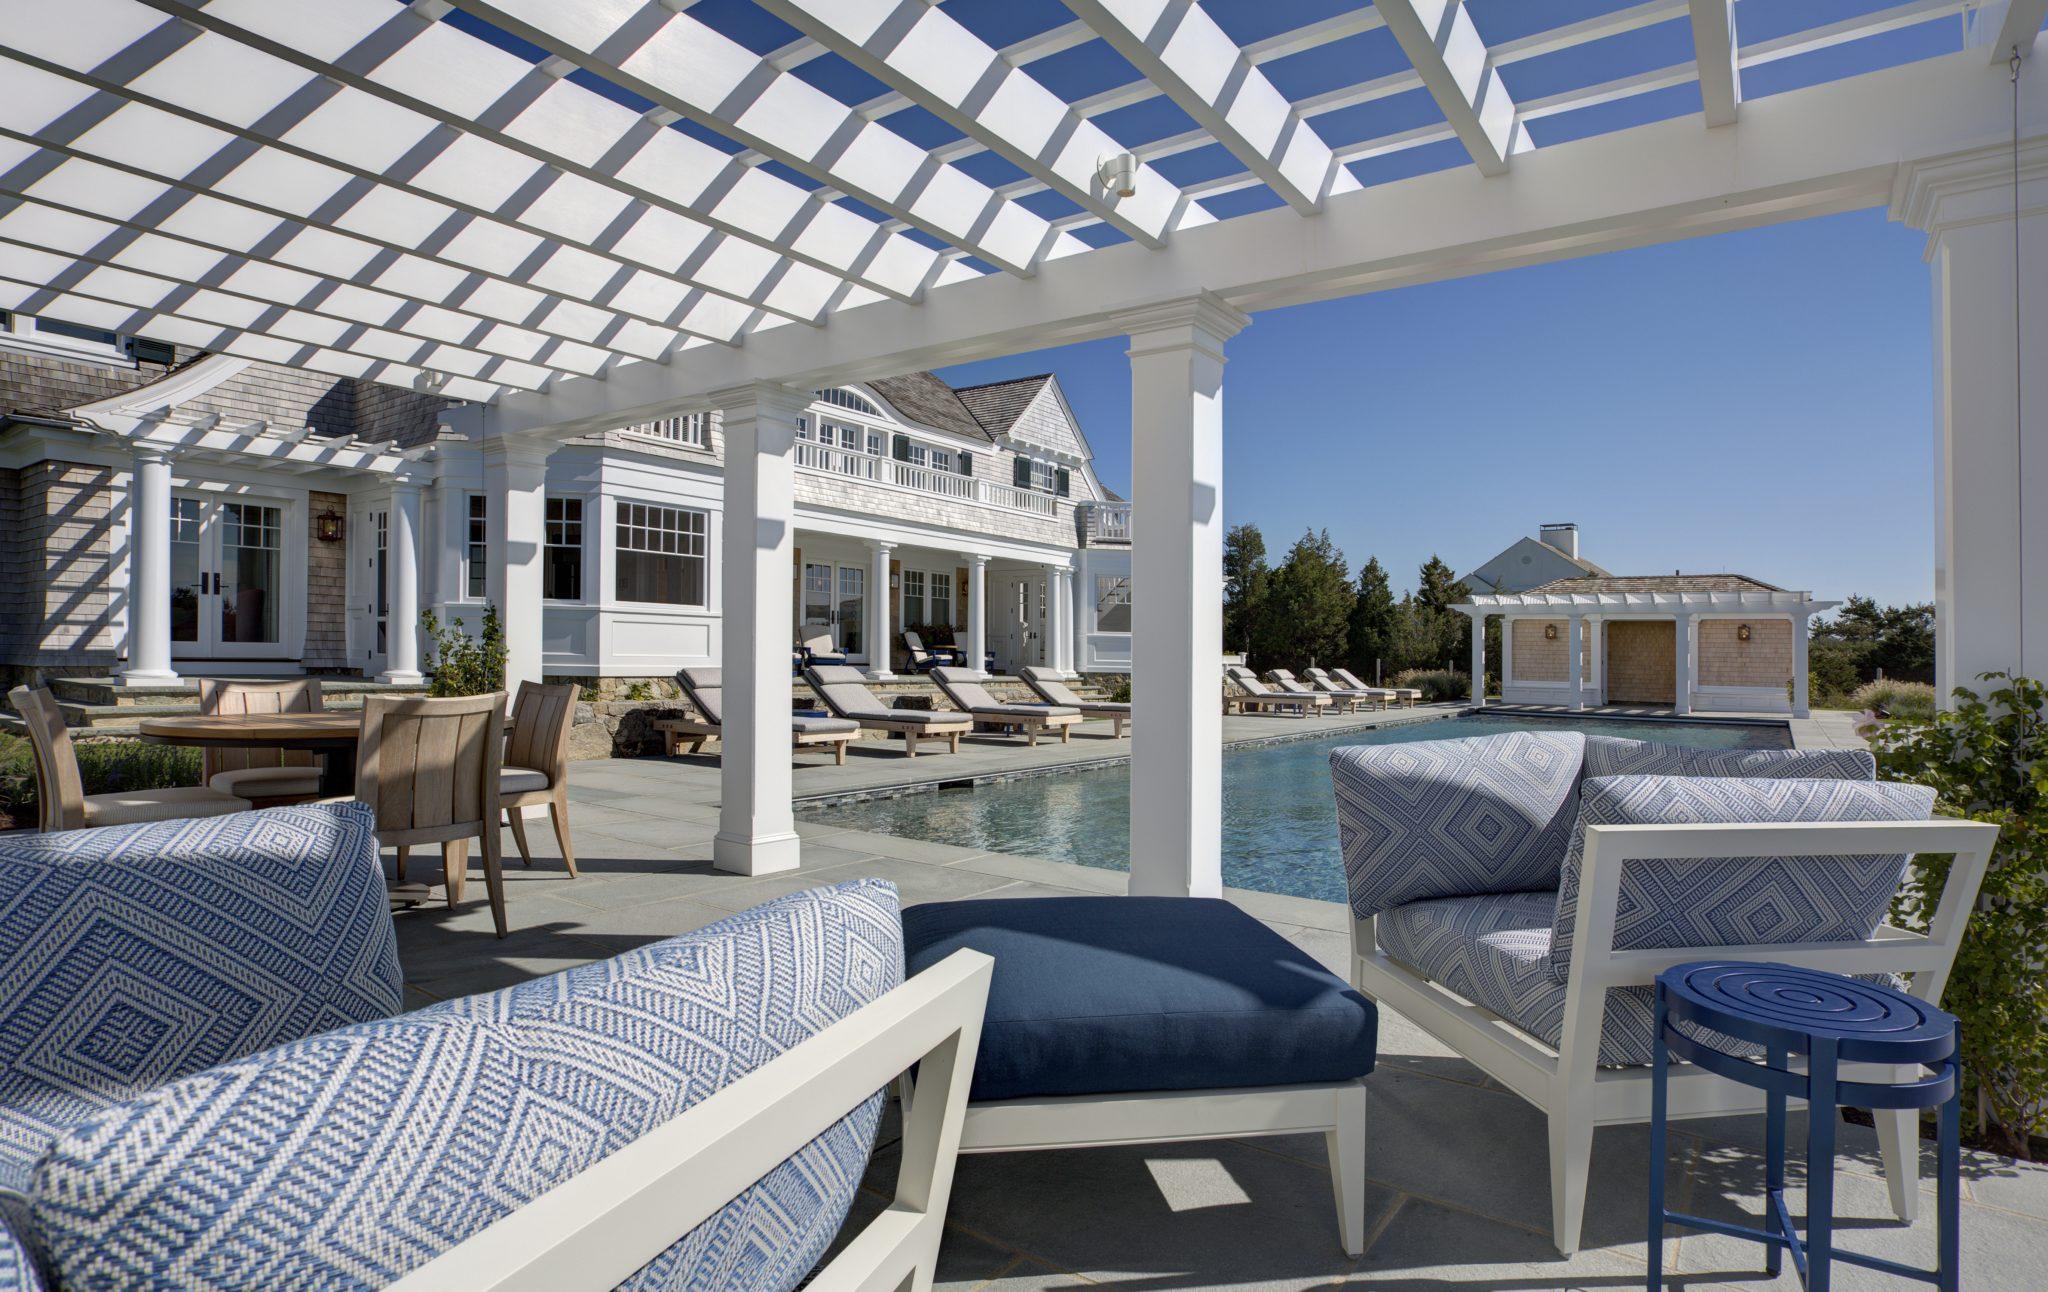 Property in Martha's Vineyard, Massachusetts, by Slifer Designs